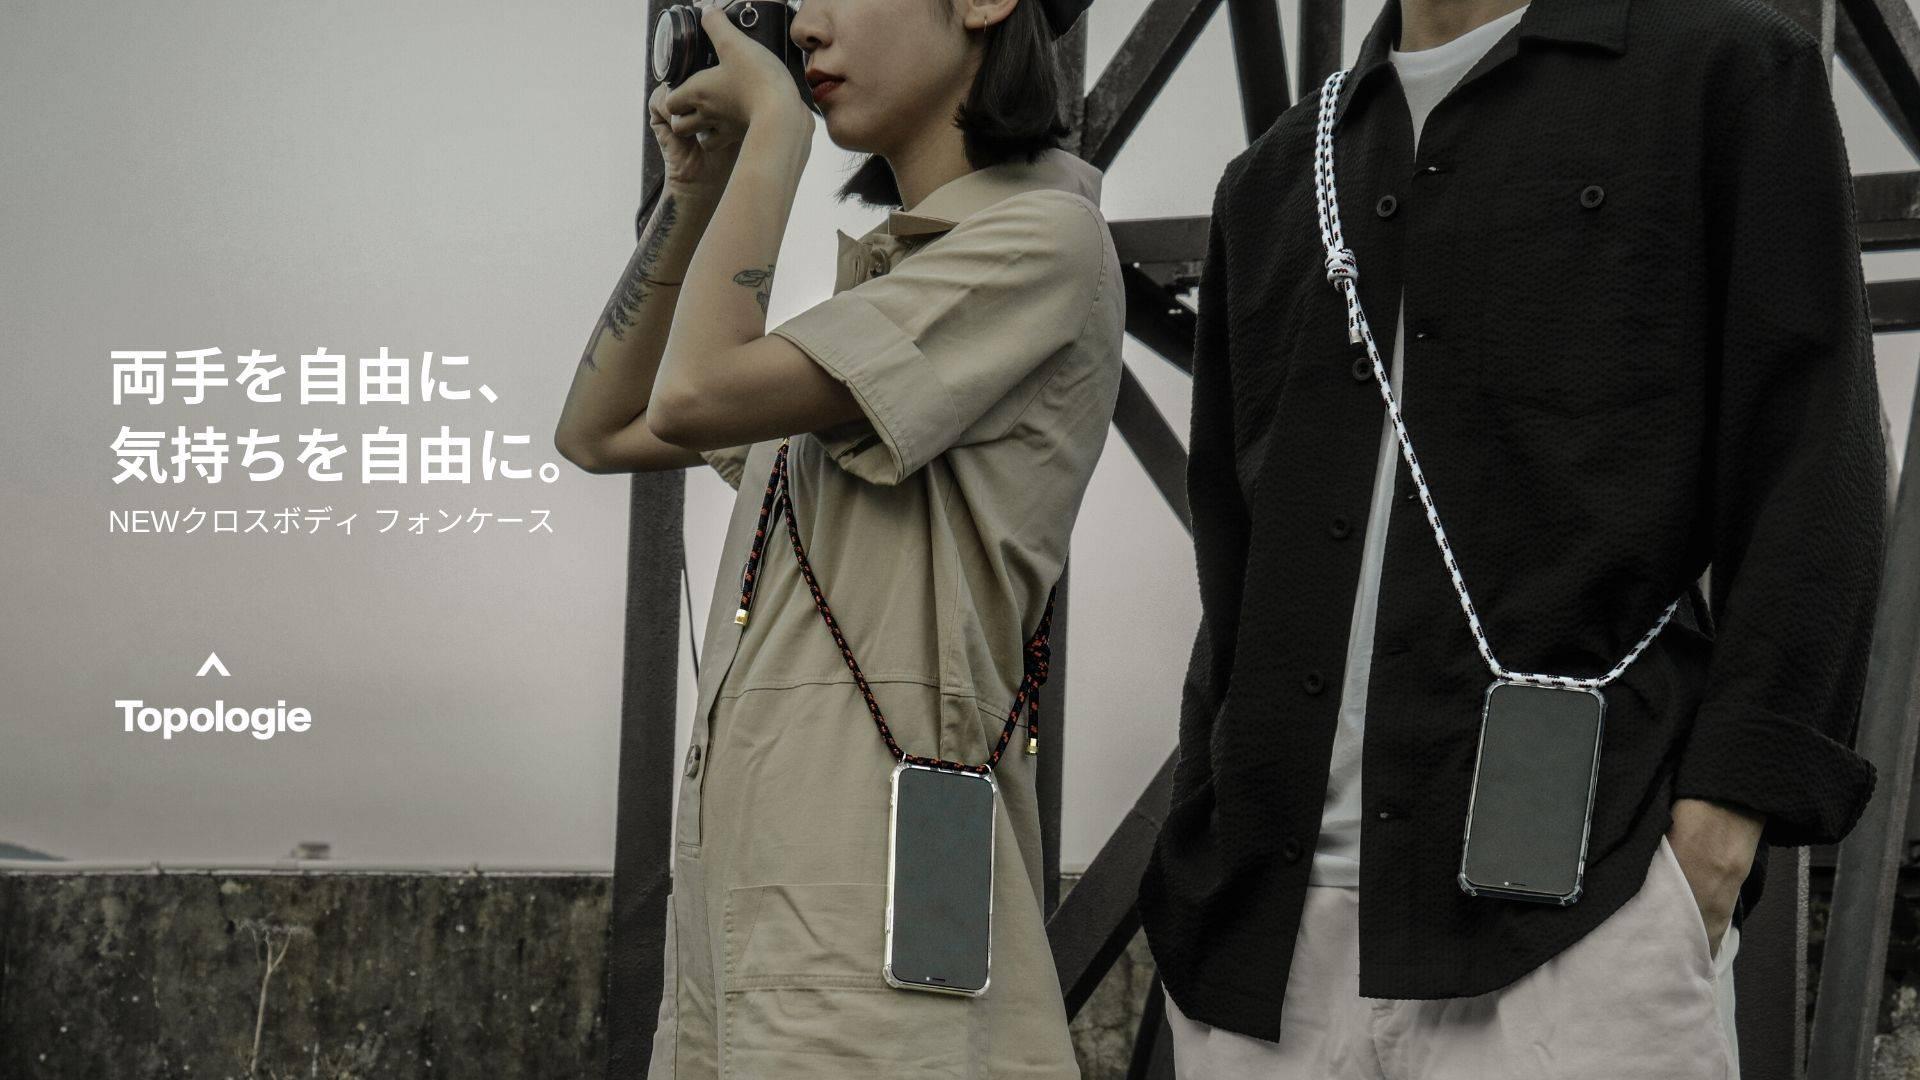 Topologie iphone 11 Case (iPhone11ケース)